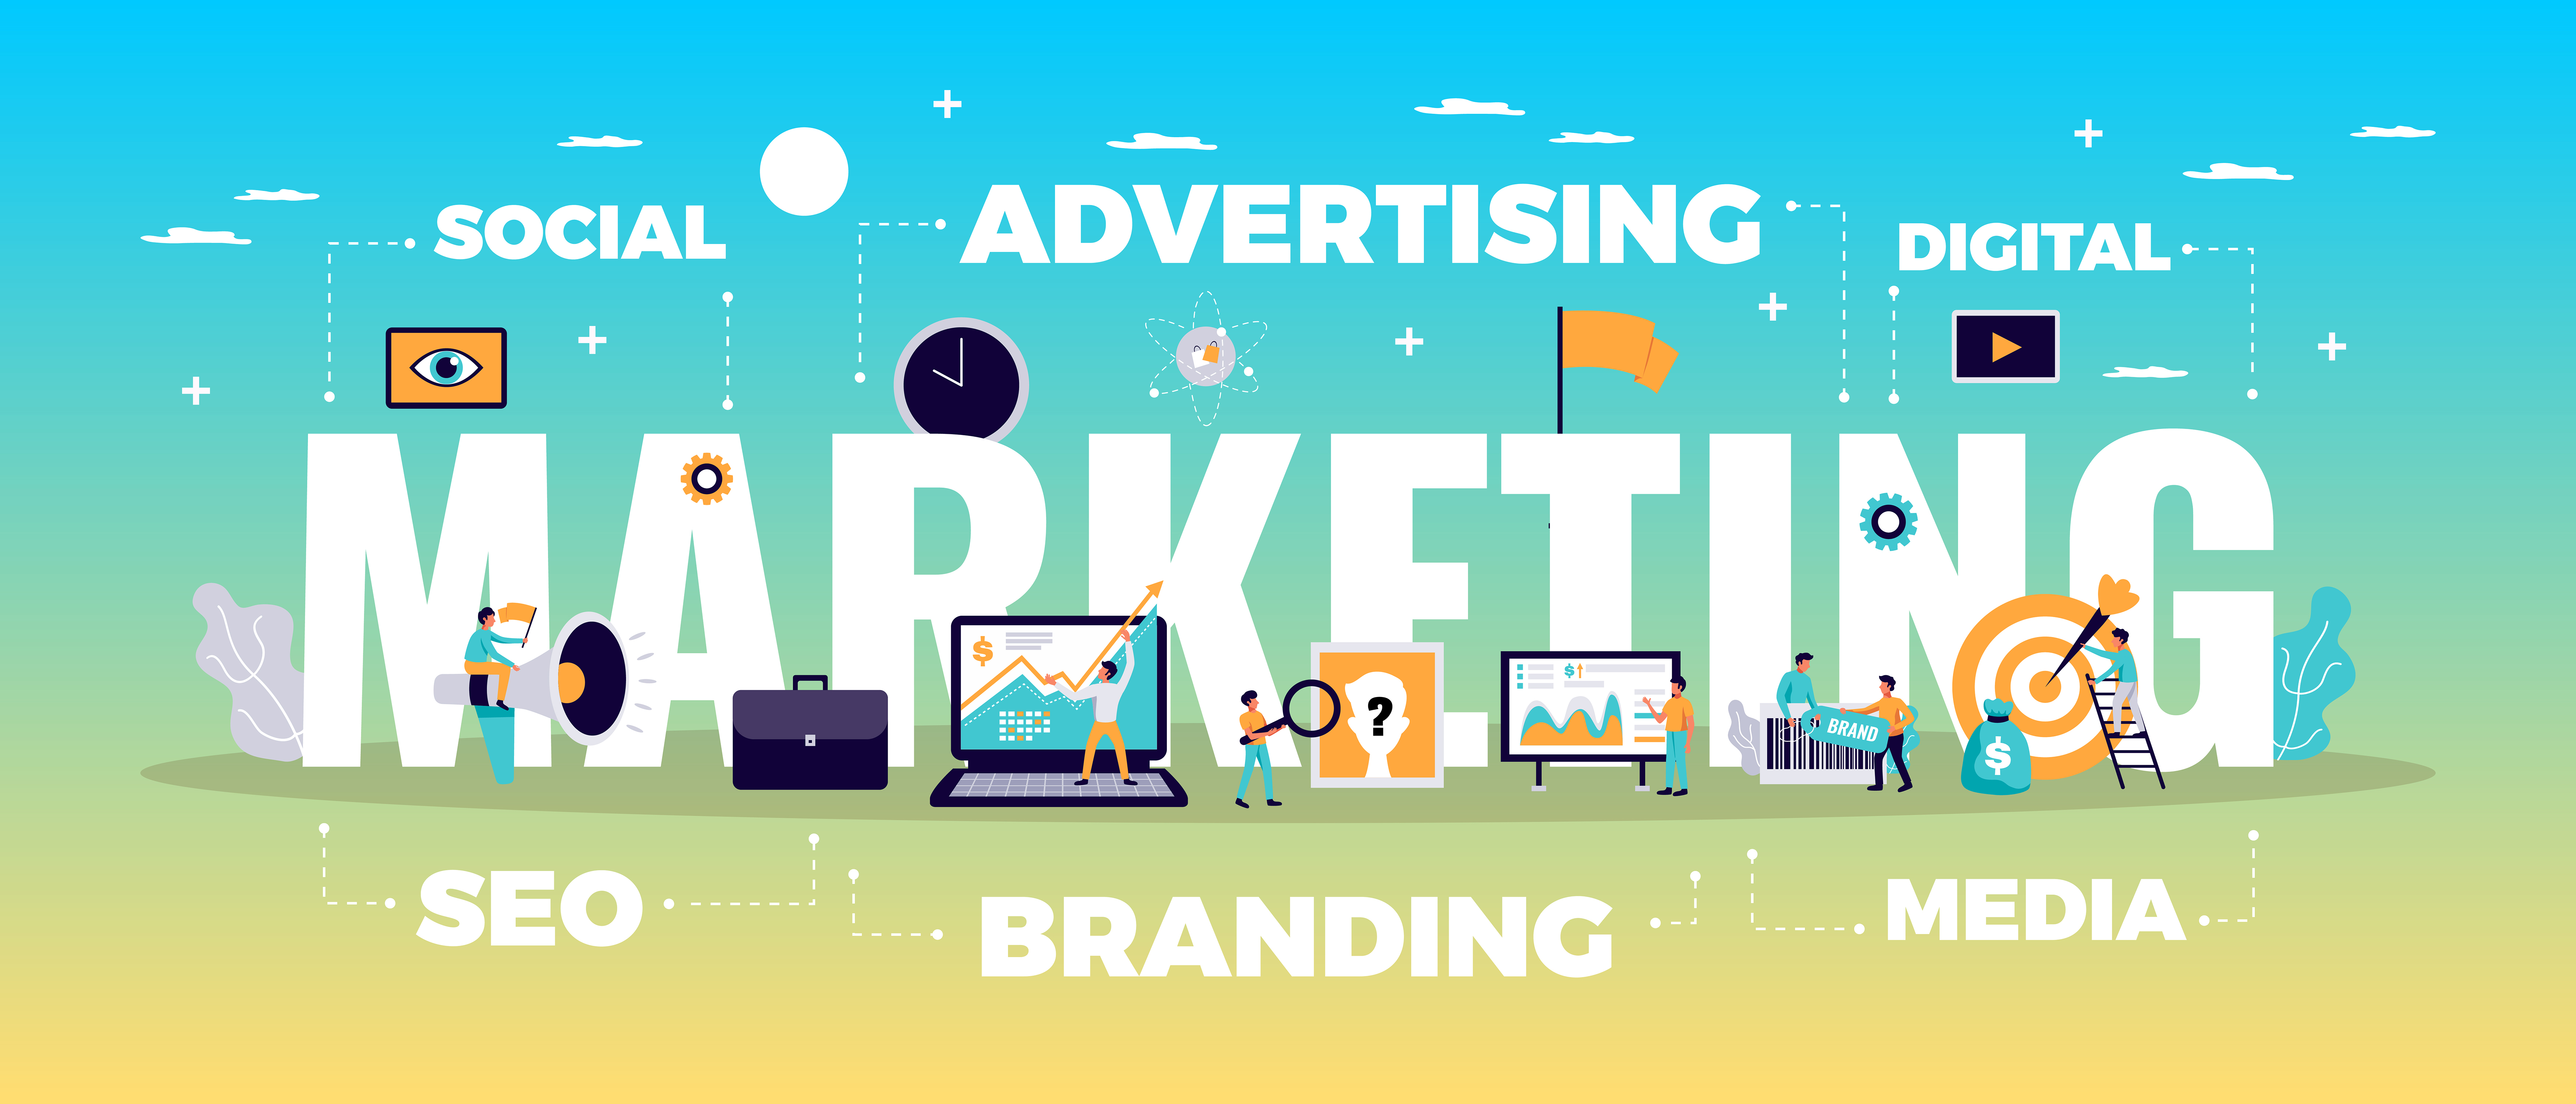 How Your Business Digital Marketing Strategy Works Marketing Advertising Branding Social SEO Digital Media